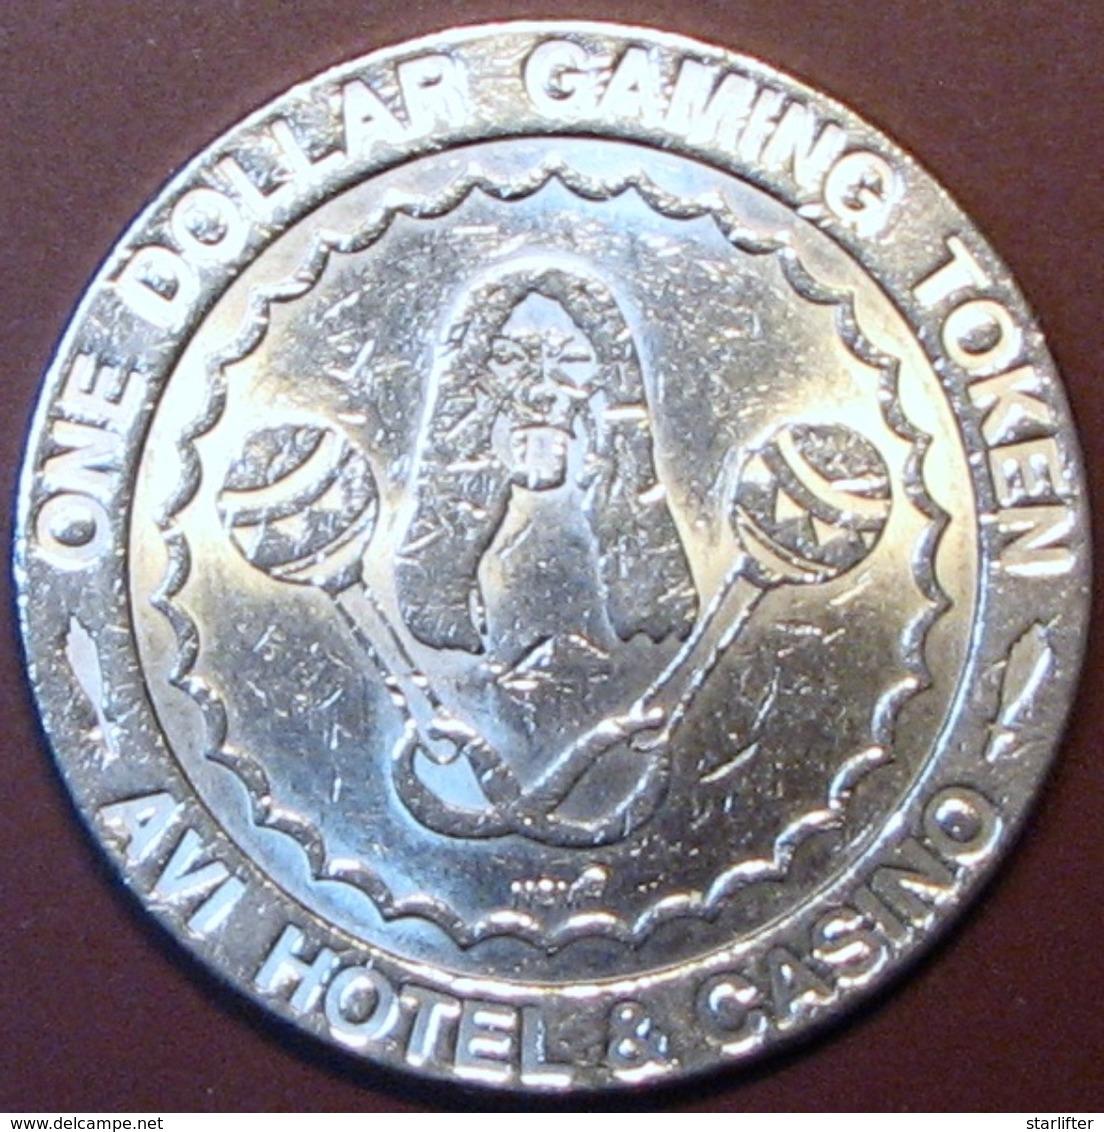 $1 Casino Token. Avi, Laughlin, NV. H90. - Casino